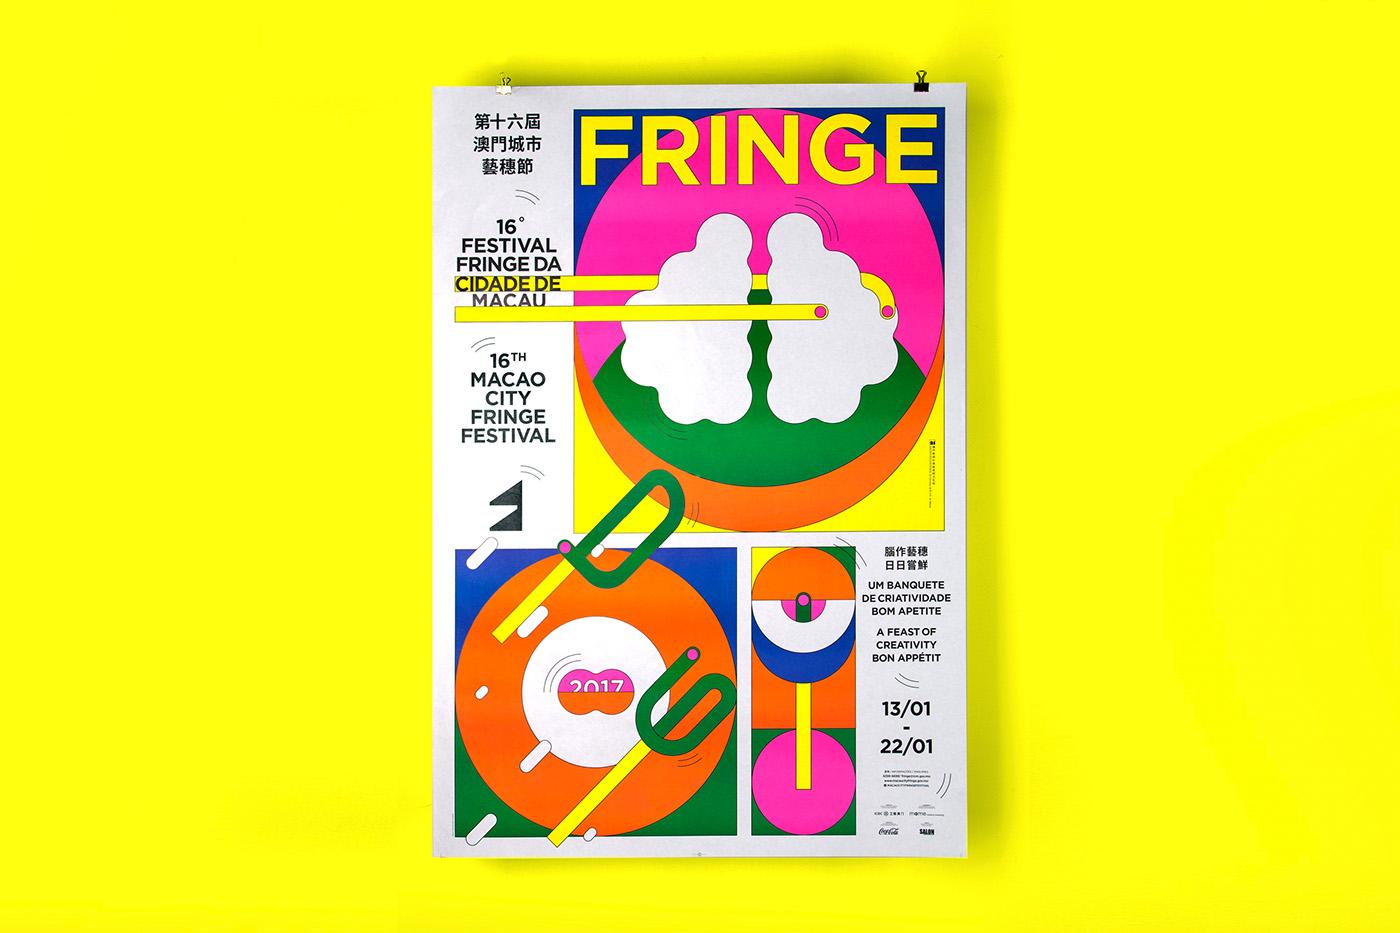 Macao Fringe graphic festival visual identity artitector Illustrator adobeawards